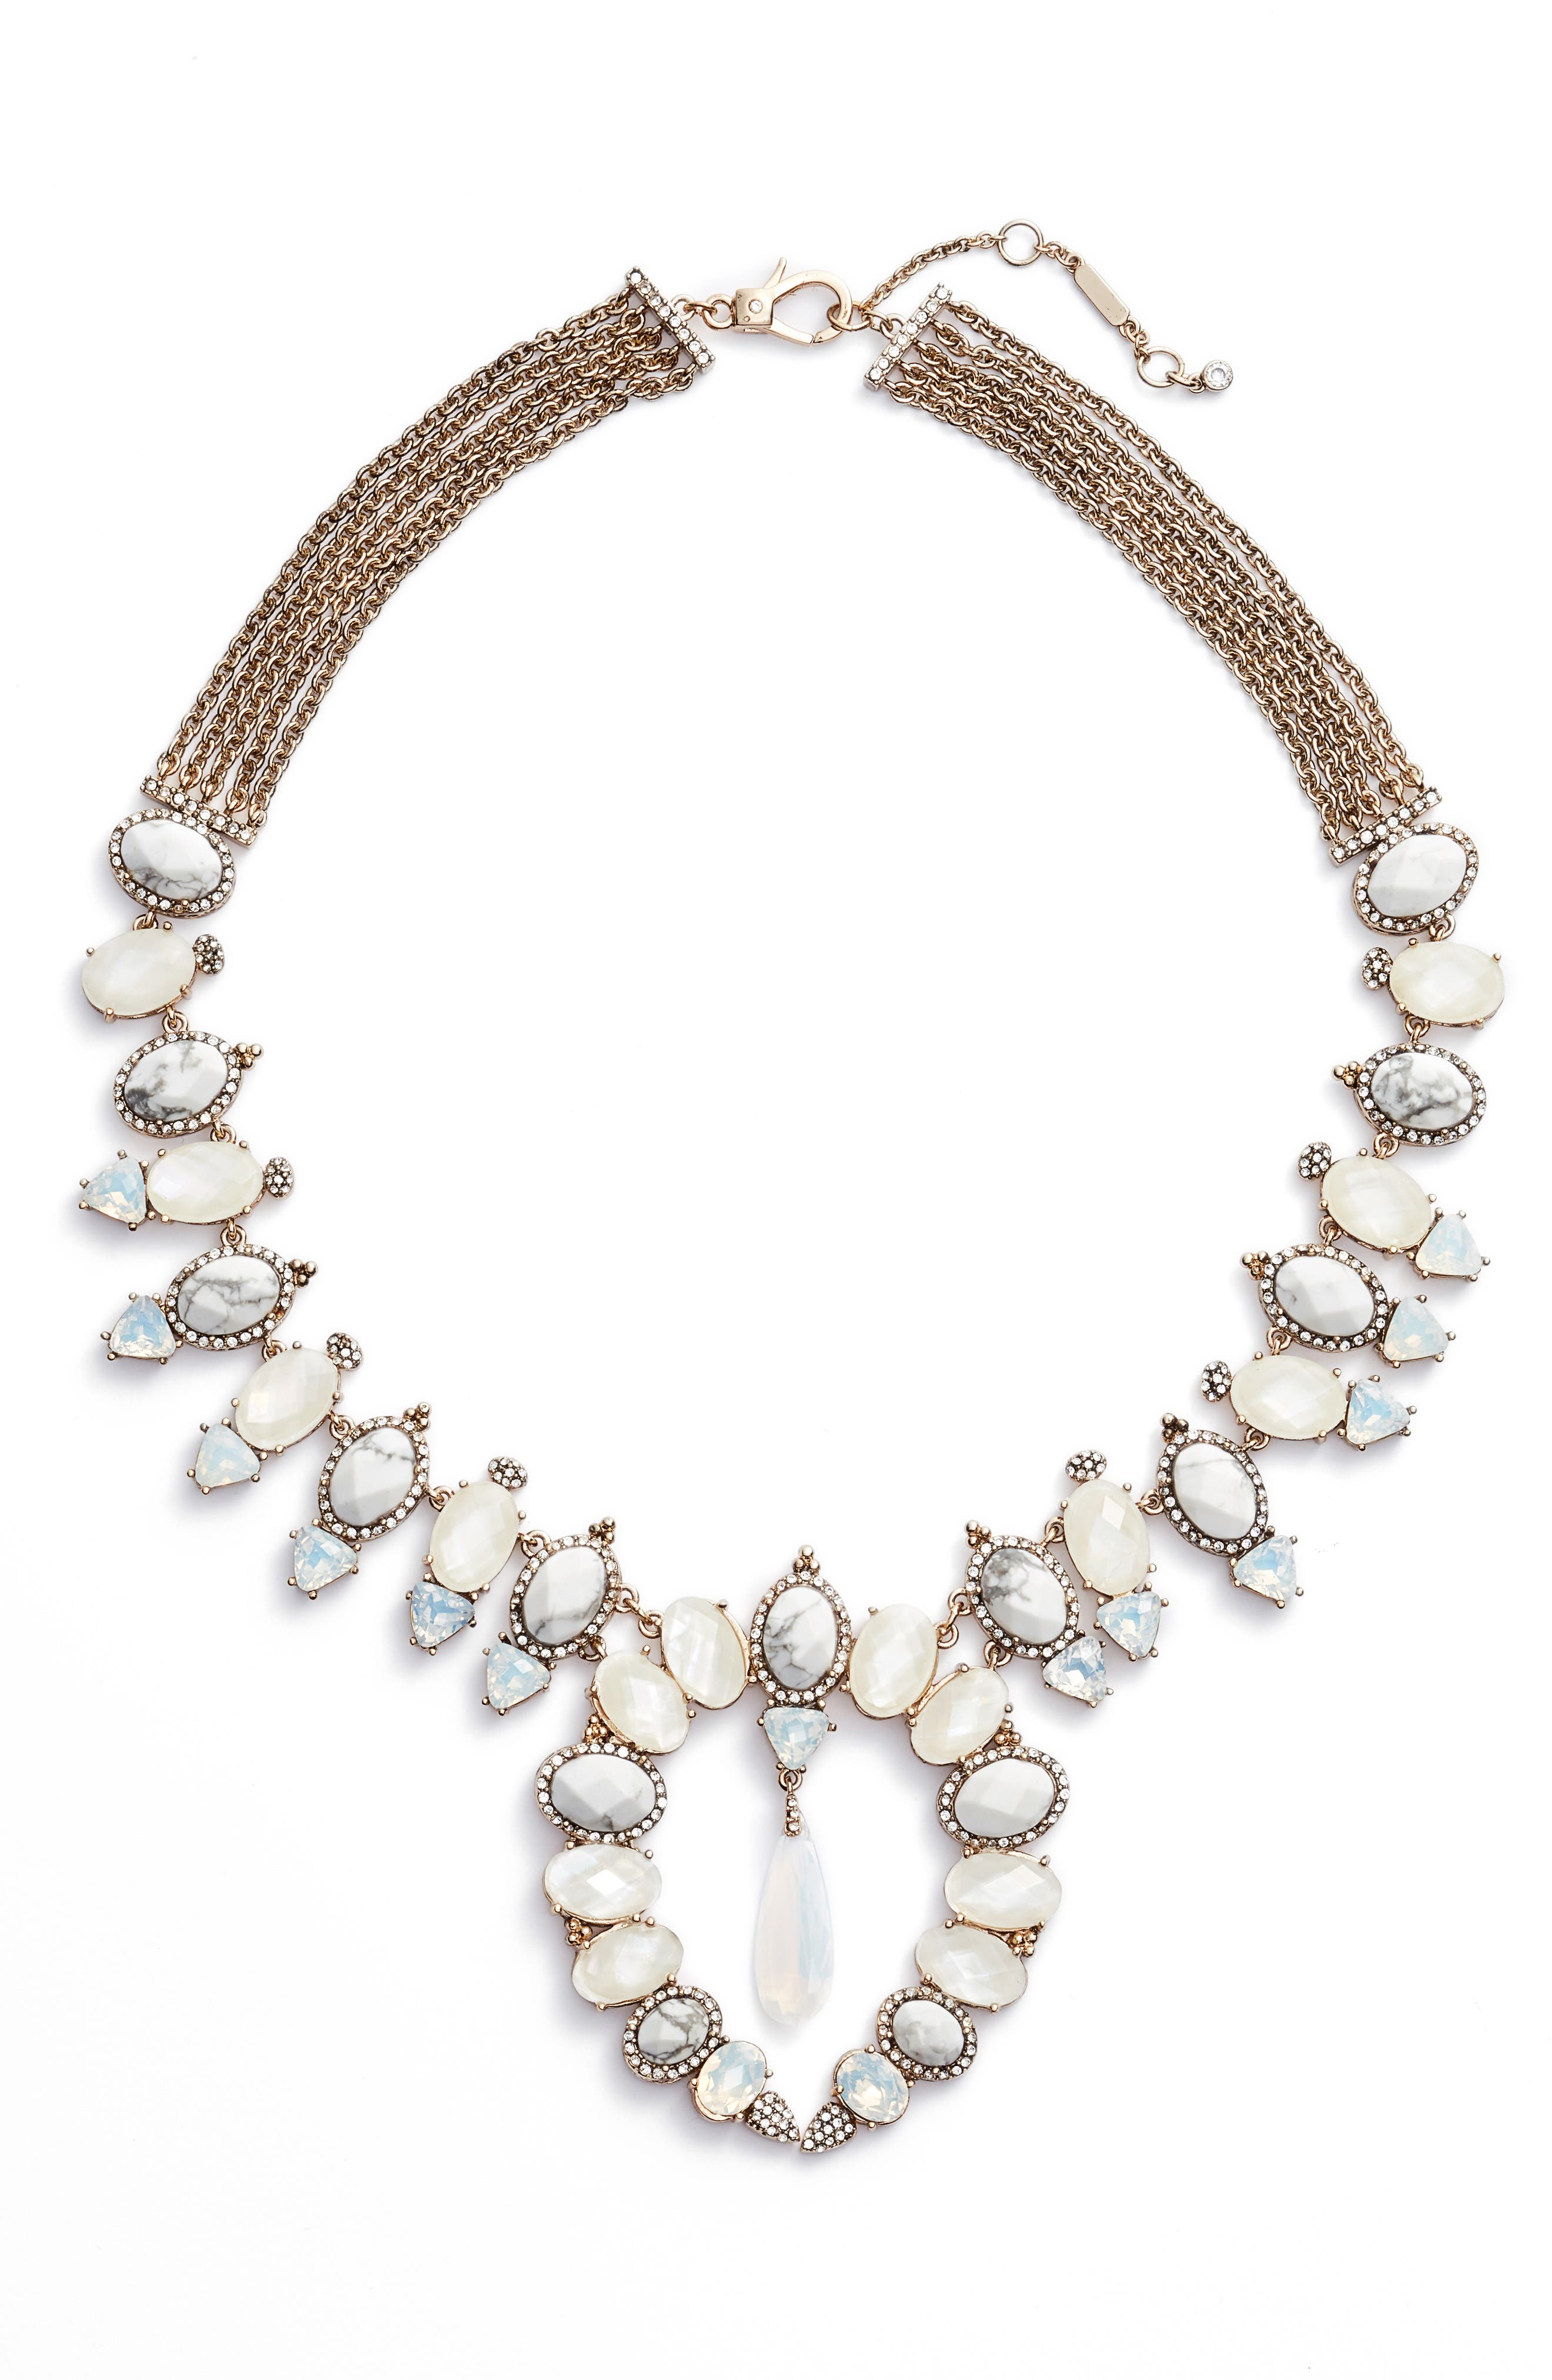 Alternate Image 1 Selected - Jenny Packham Wanderlust Collar Necklace